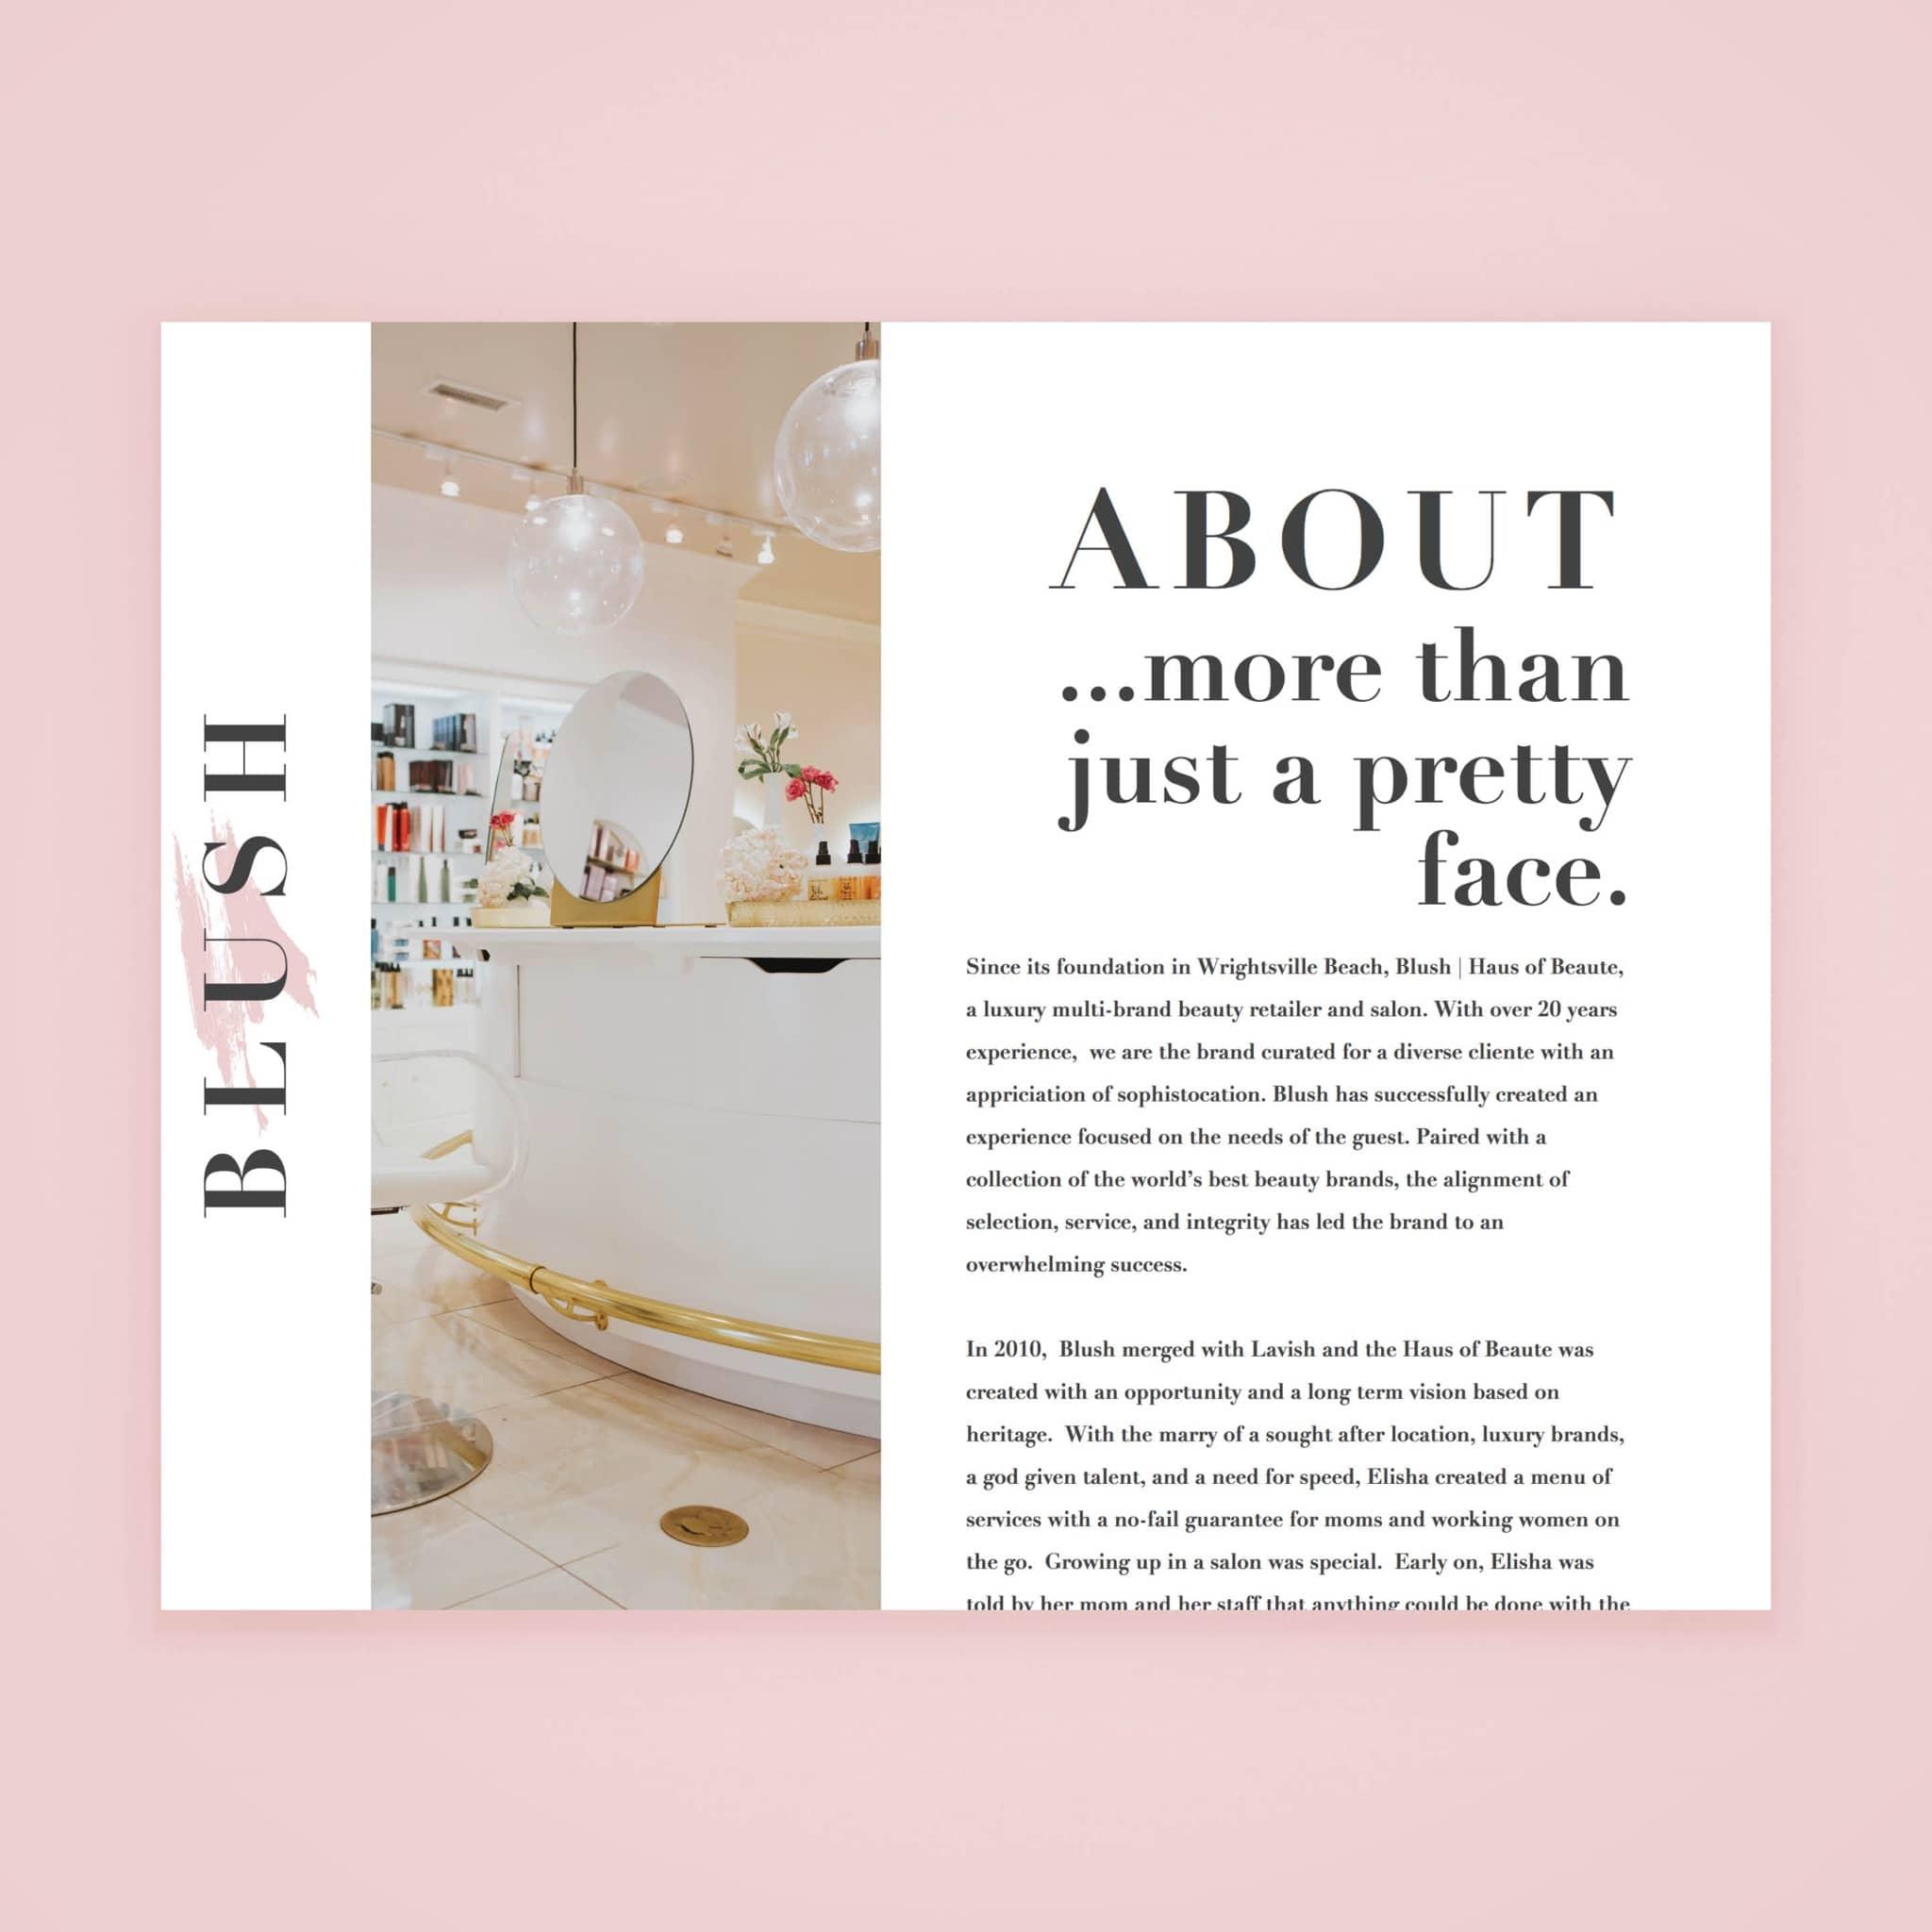 Blush HOB - Web Design by Brand Engine